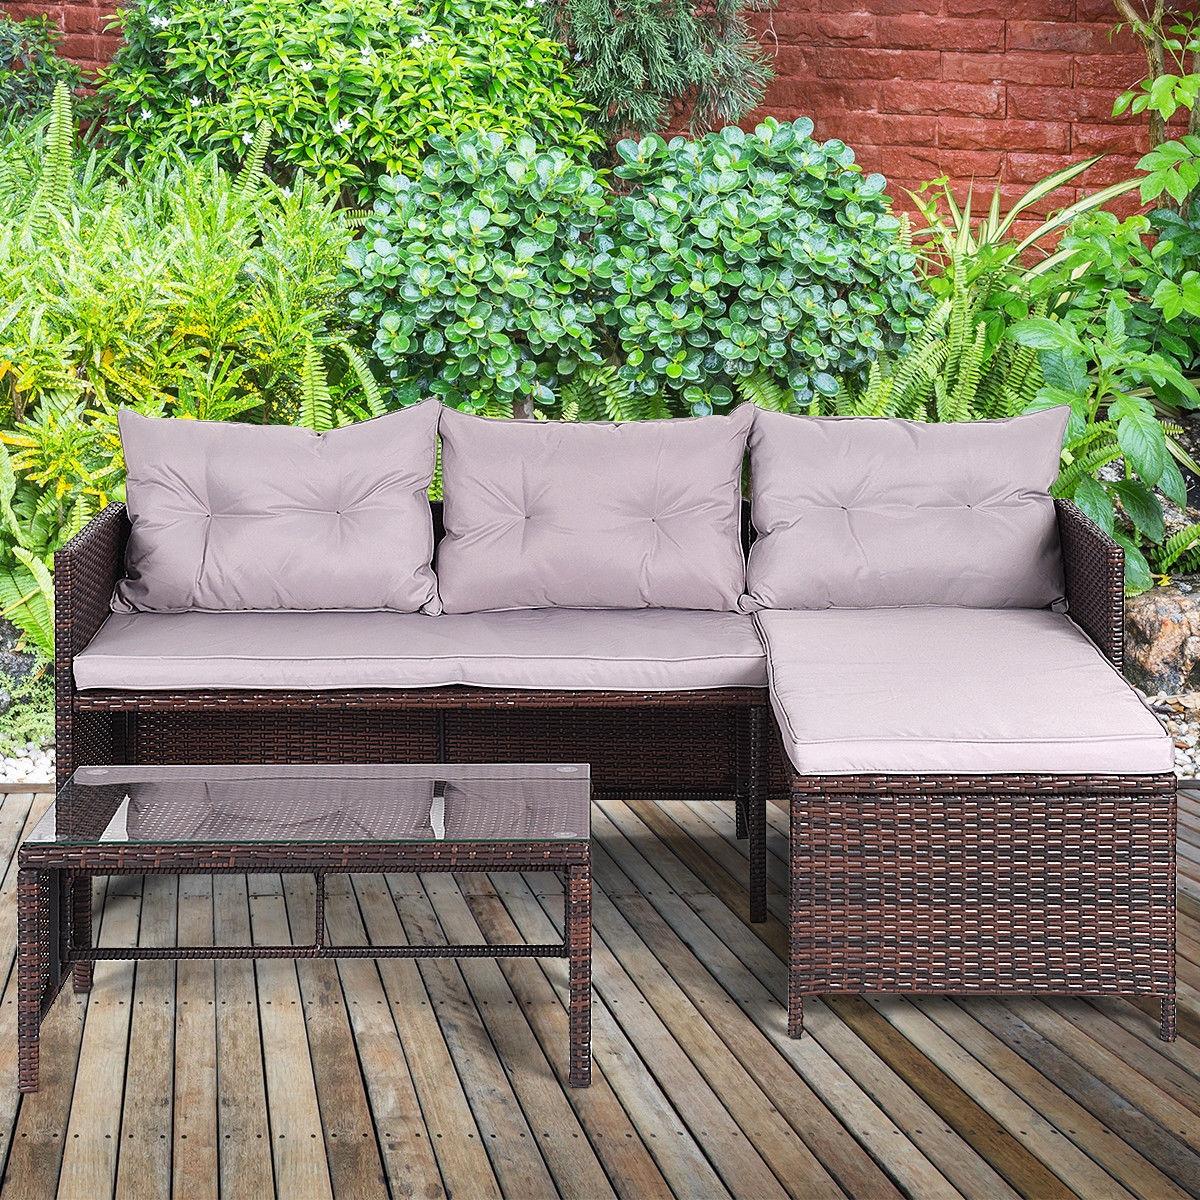 3 pcs Rattan Wicker Deck Couch Outdoor Patio Sofa Set